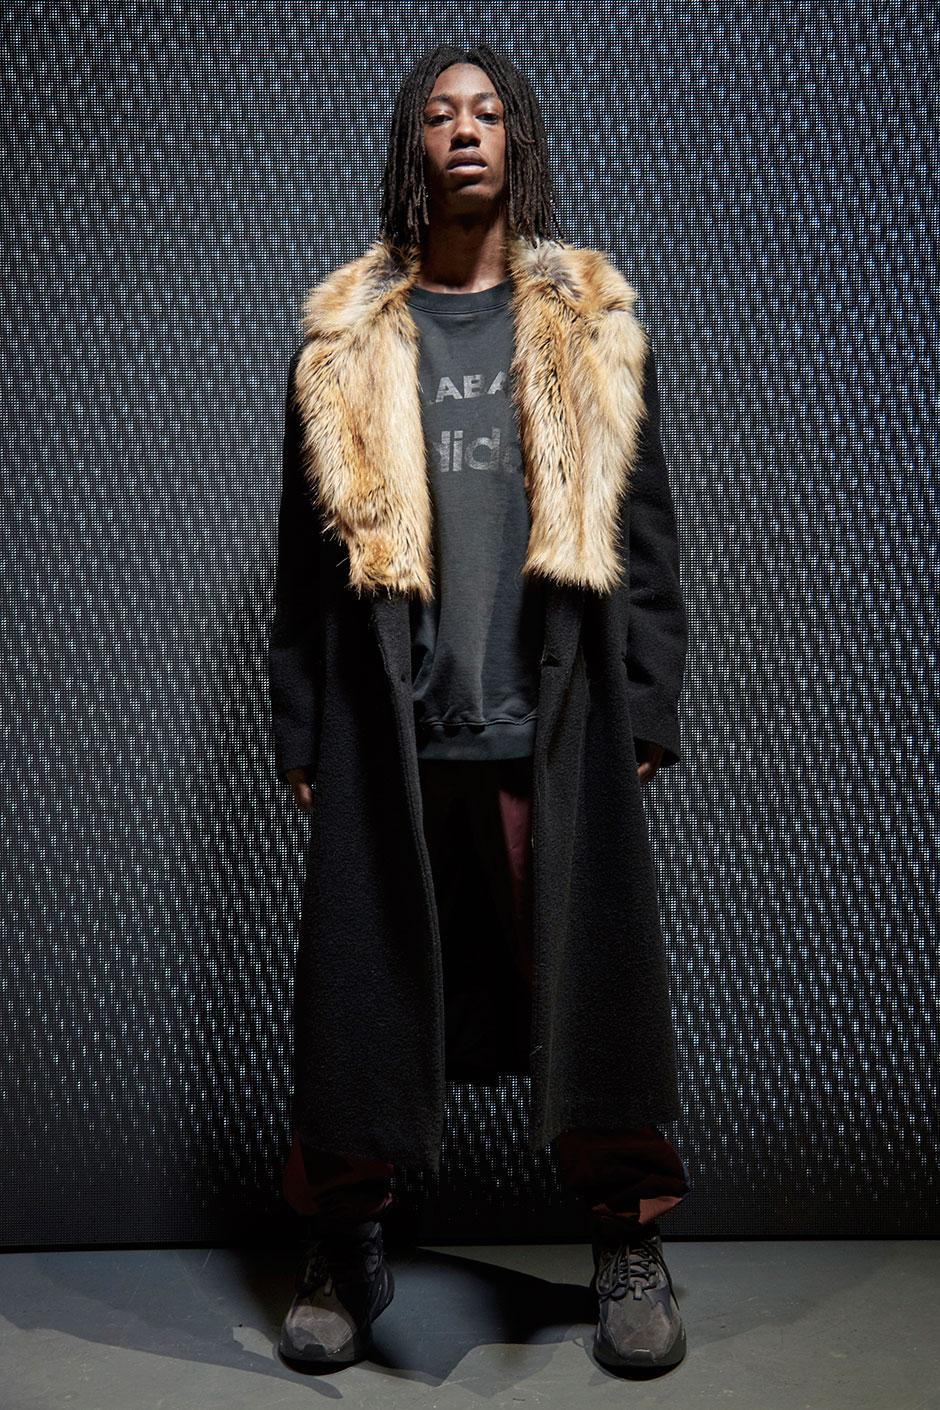 ec8c1f6aa Complete Yeezy Season 5 Clothing Footwear Recap